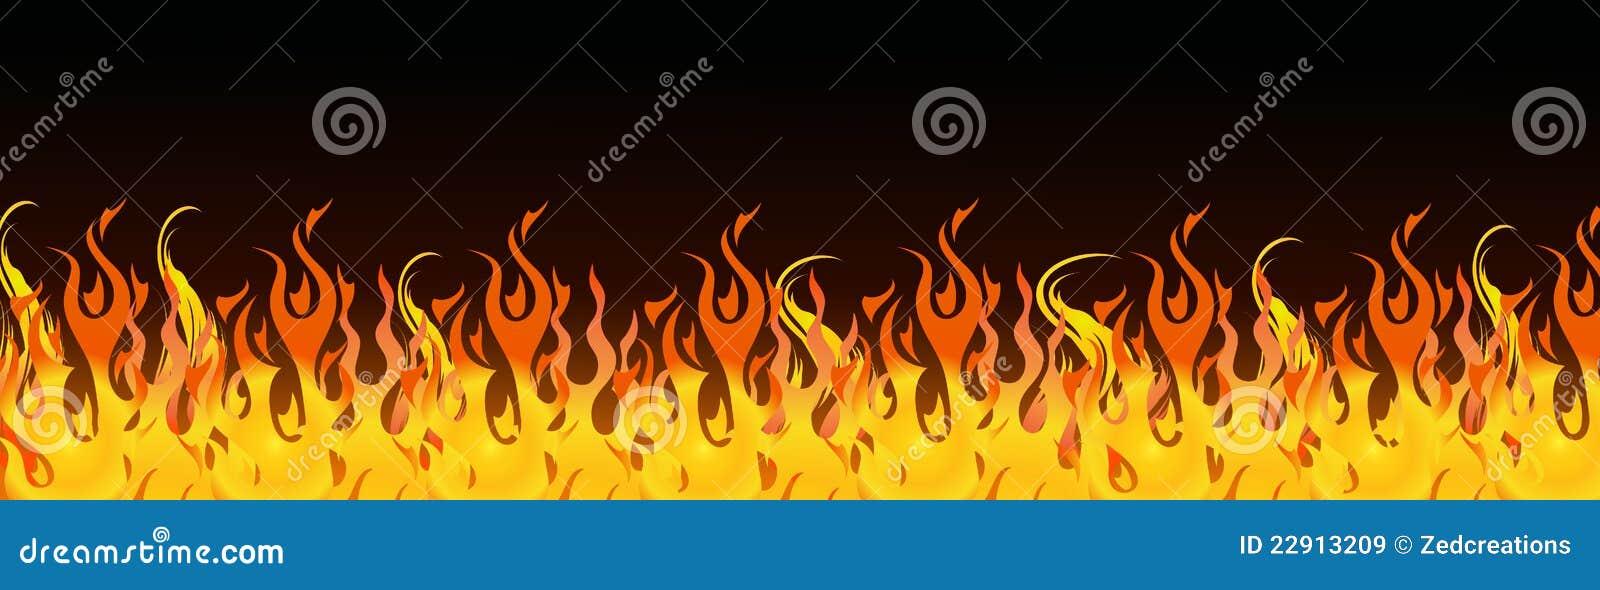 Flames web header